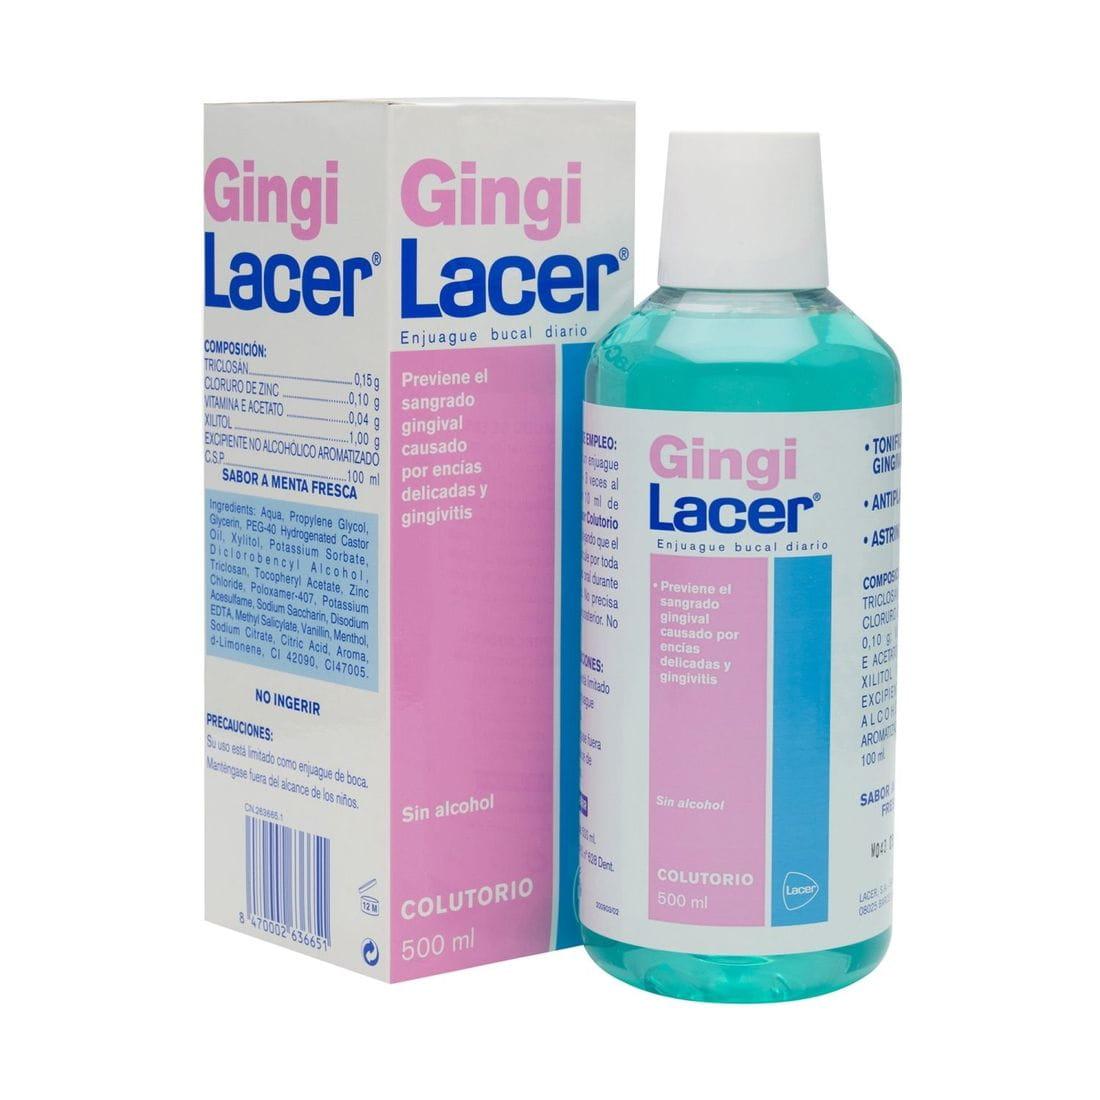 Lacer GingiLacer Colutorio 500ml